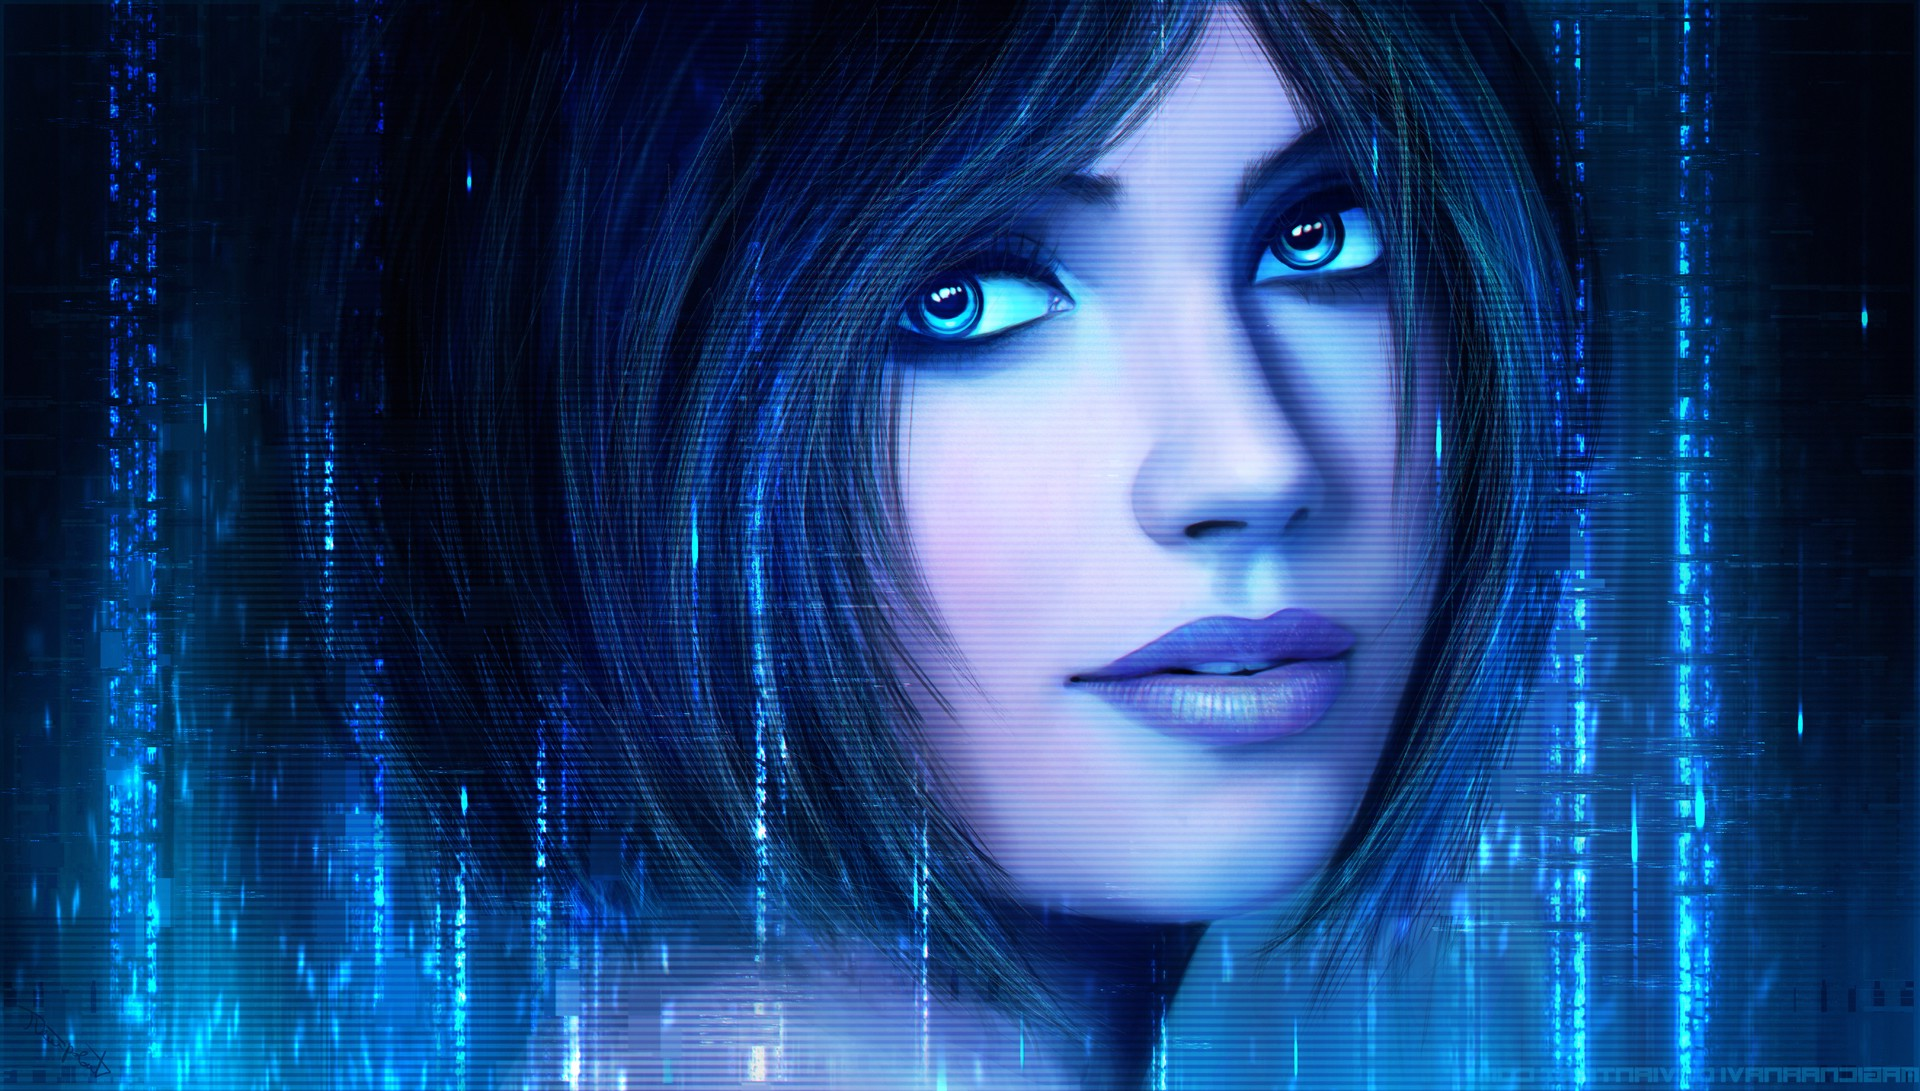 Cortana Halo 126777   HD Wallpaper Download 1920x1091